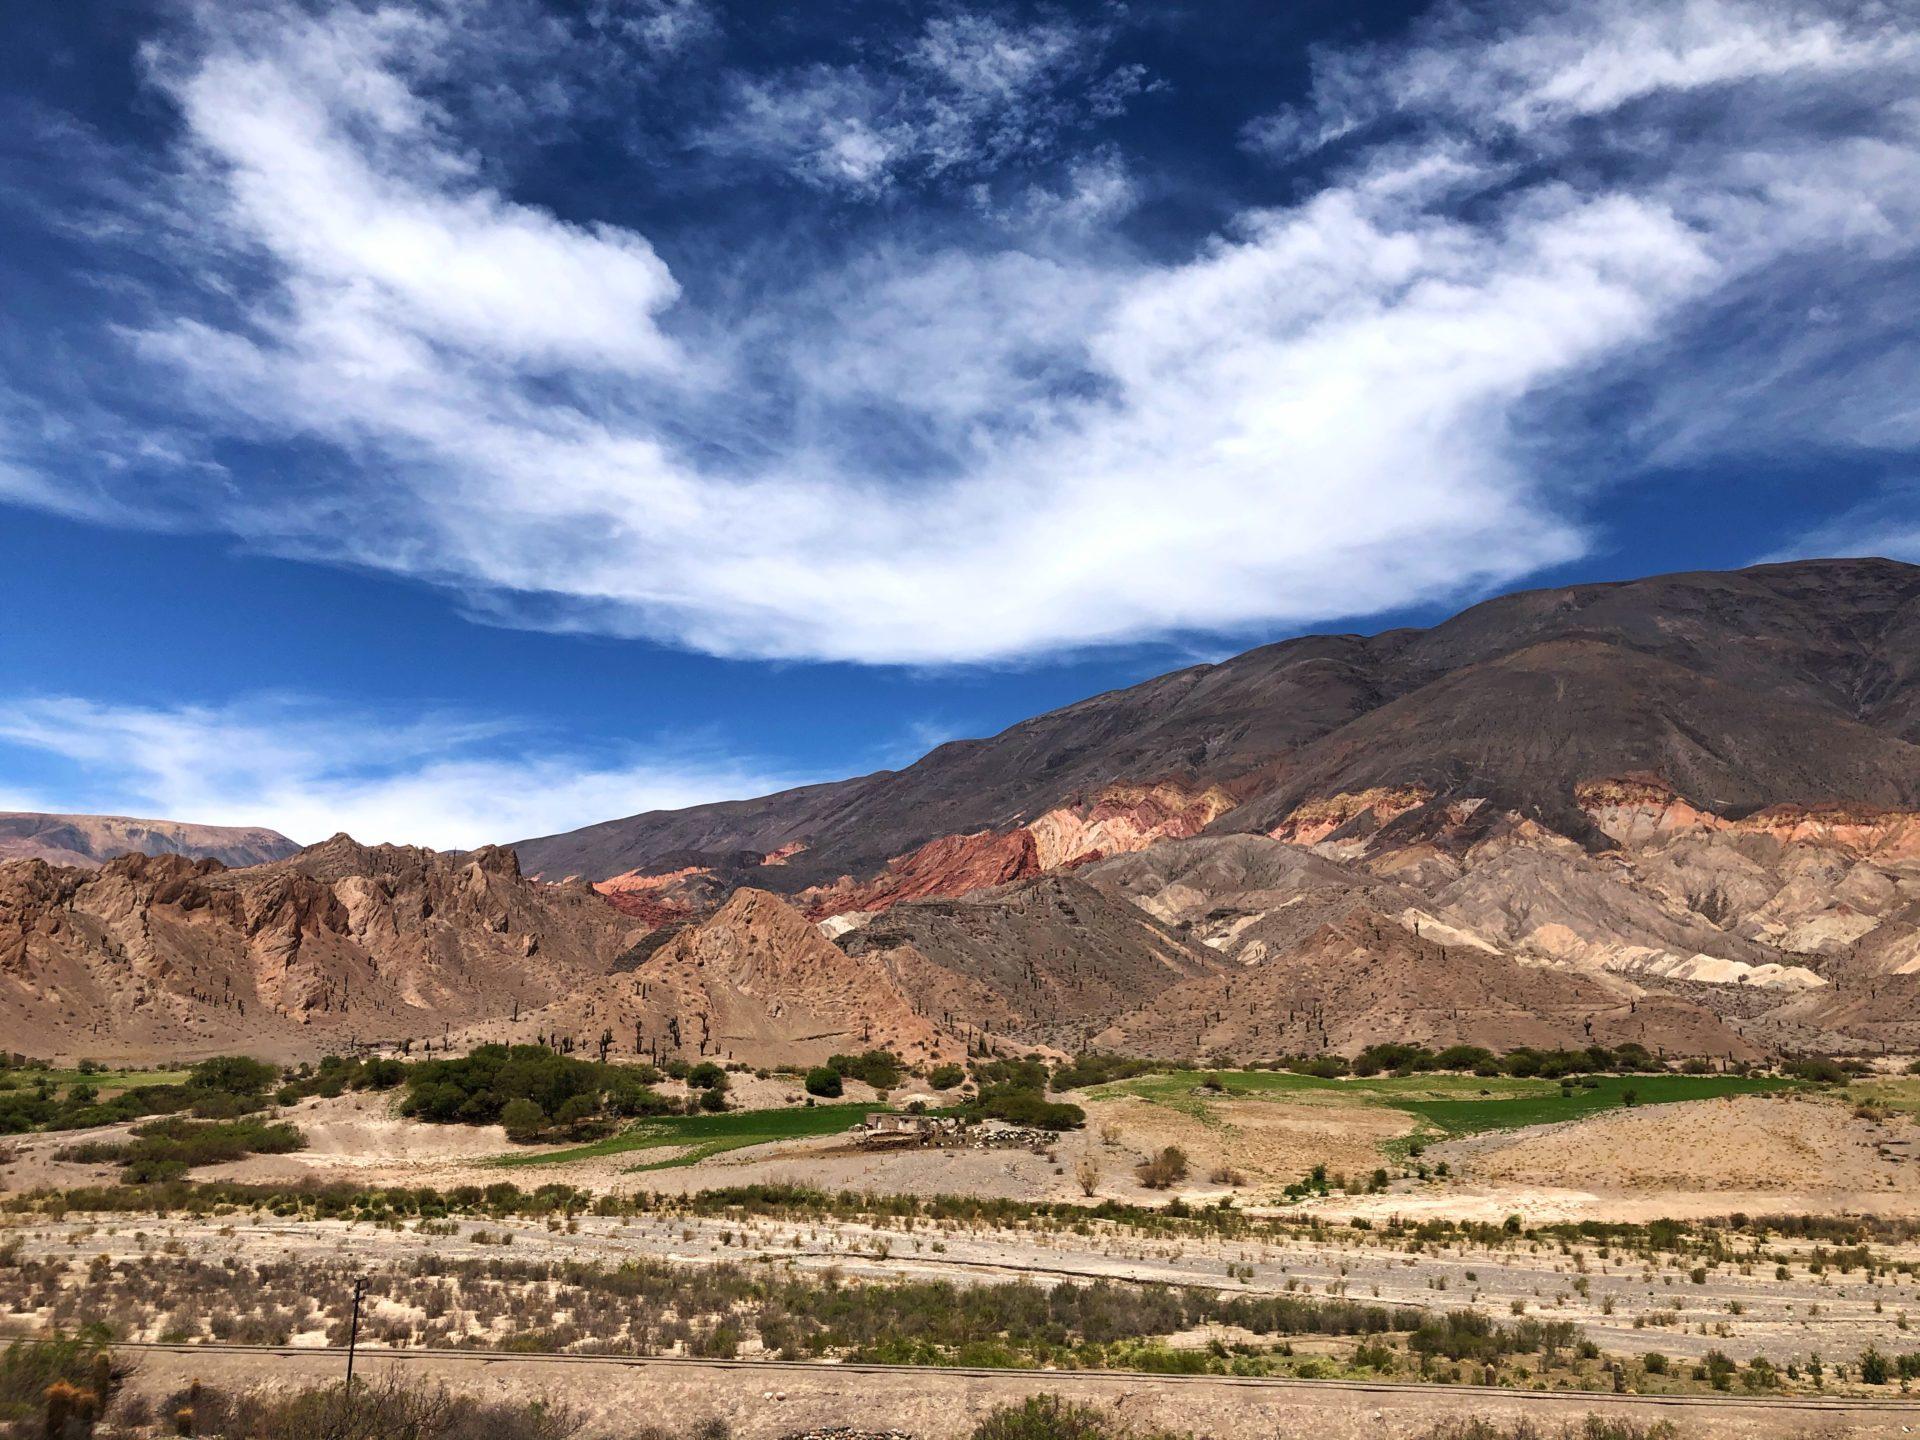 Kuriose Felsformationen auf knapp 3000 Höhenmetern